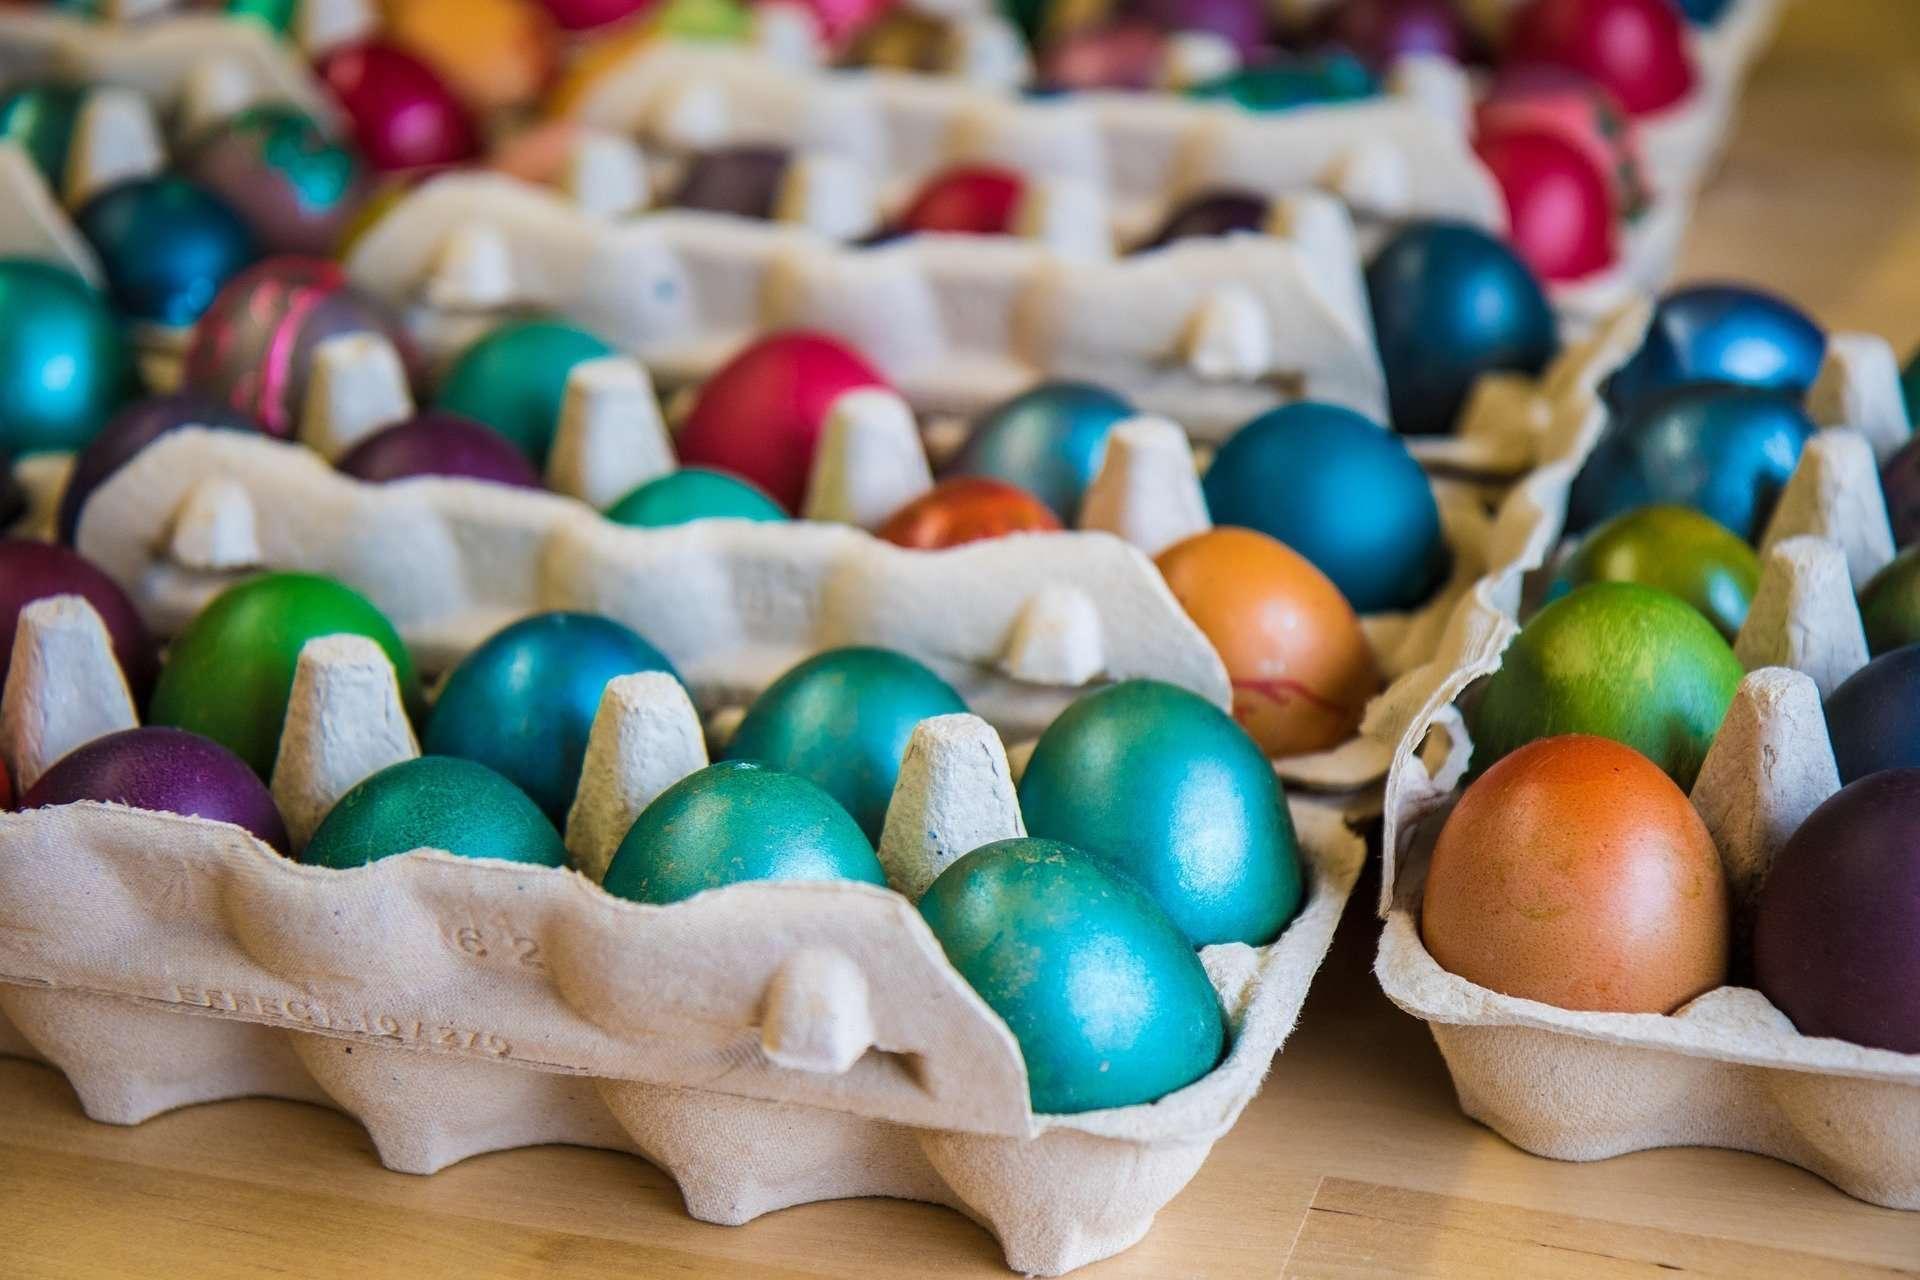 Egg painting saitama children's zoo easter event